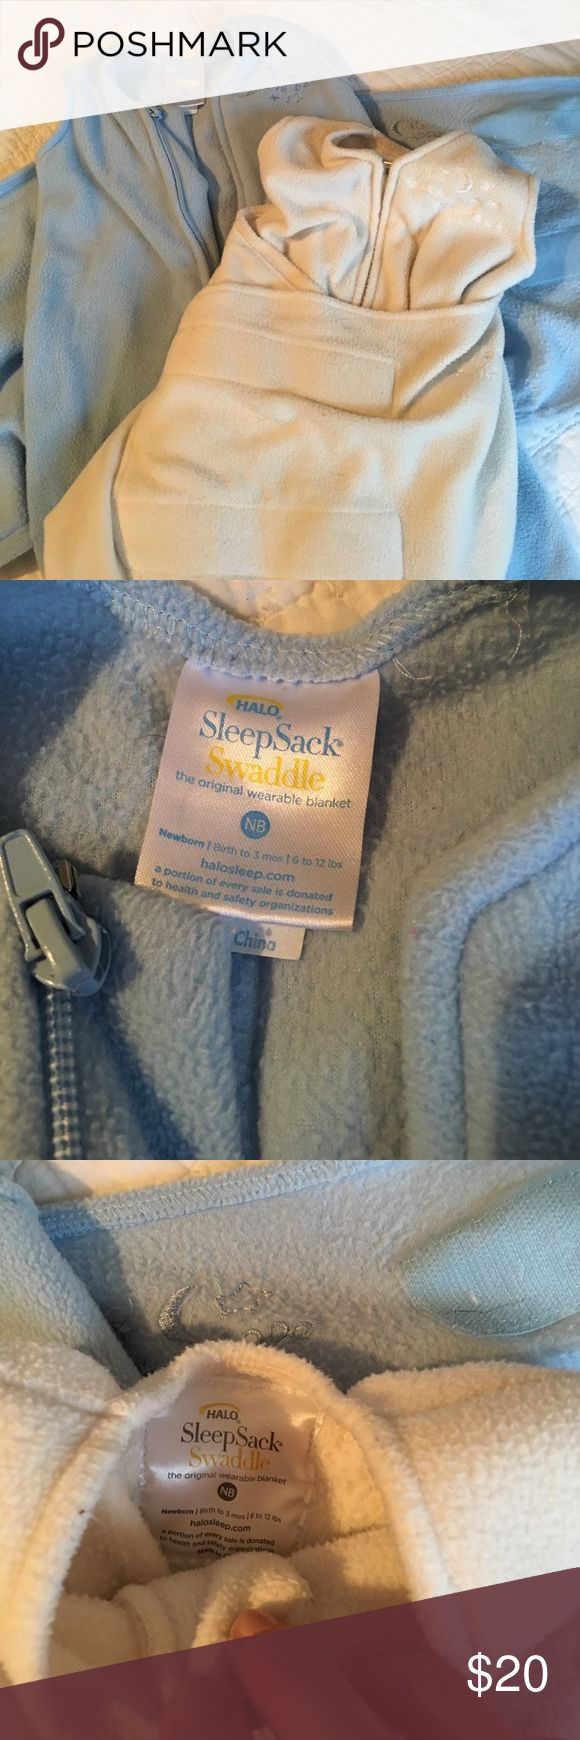 Or sleeping bags clothes pegs optional fairy lights optional - Halo Sleepsack Bundle